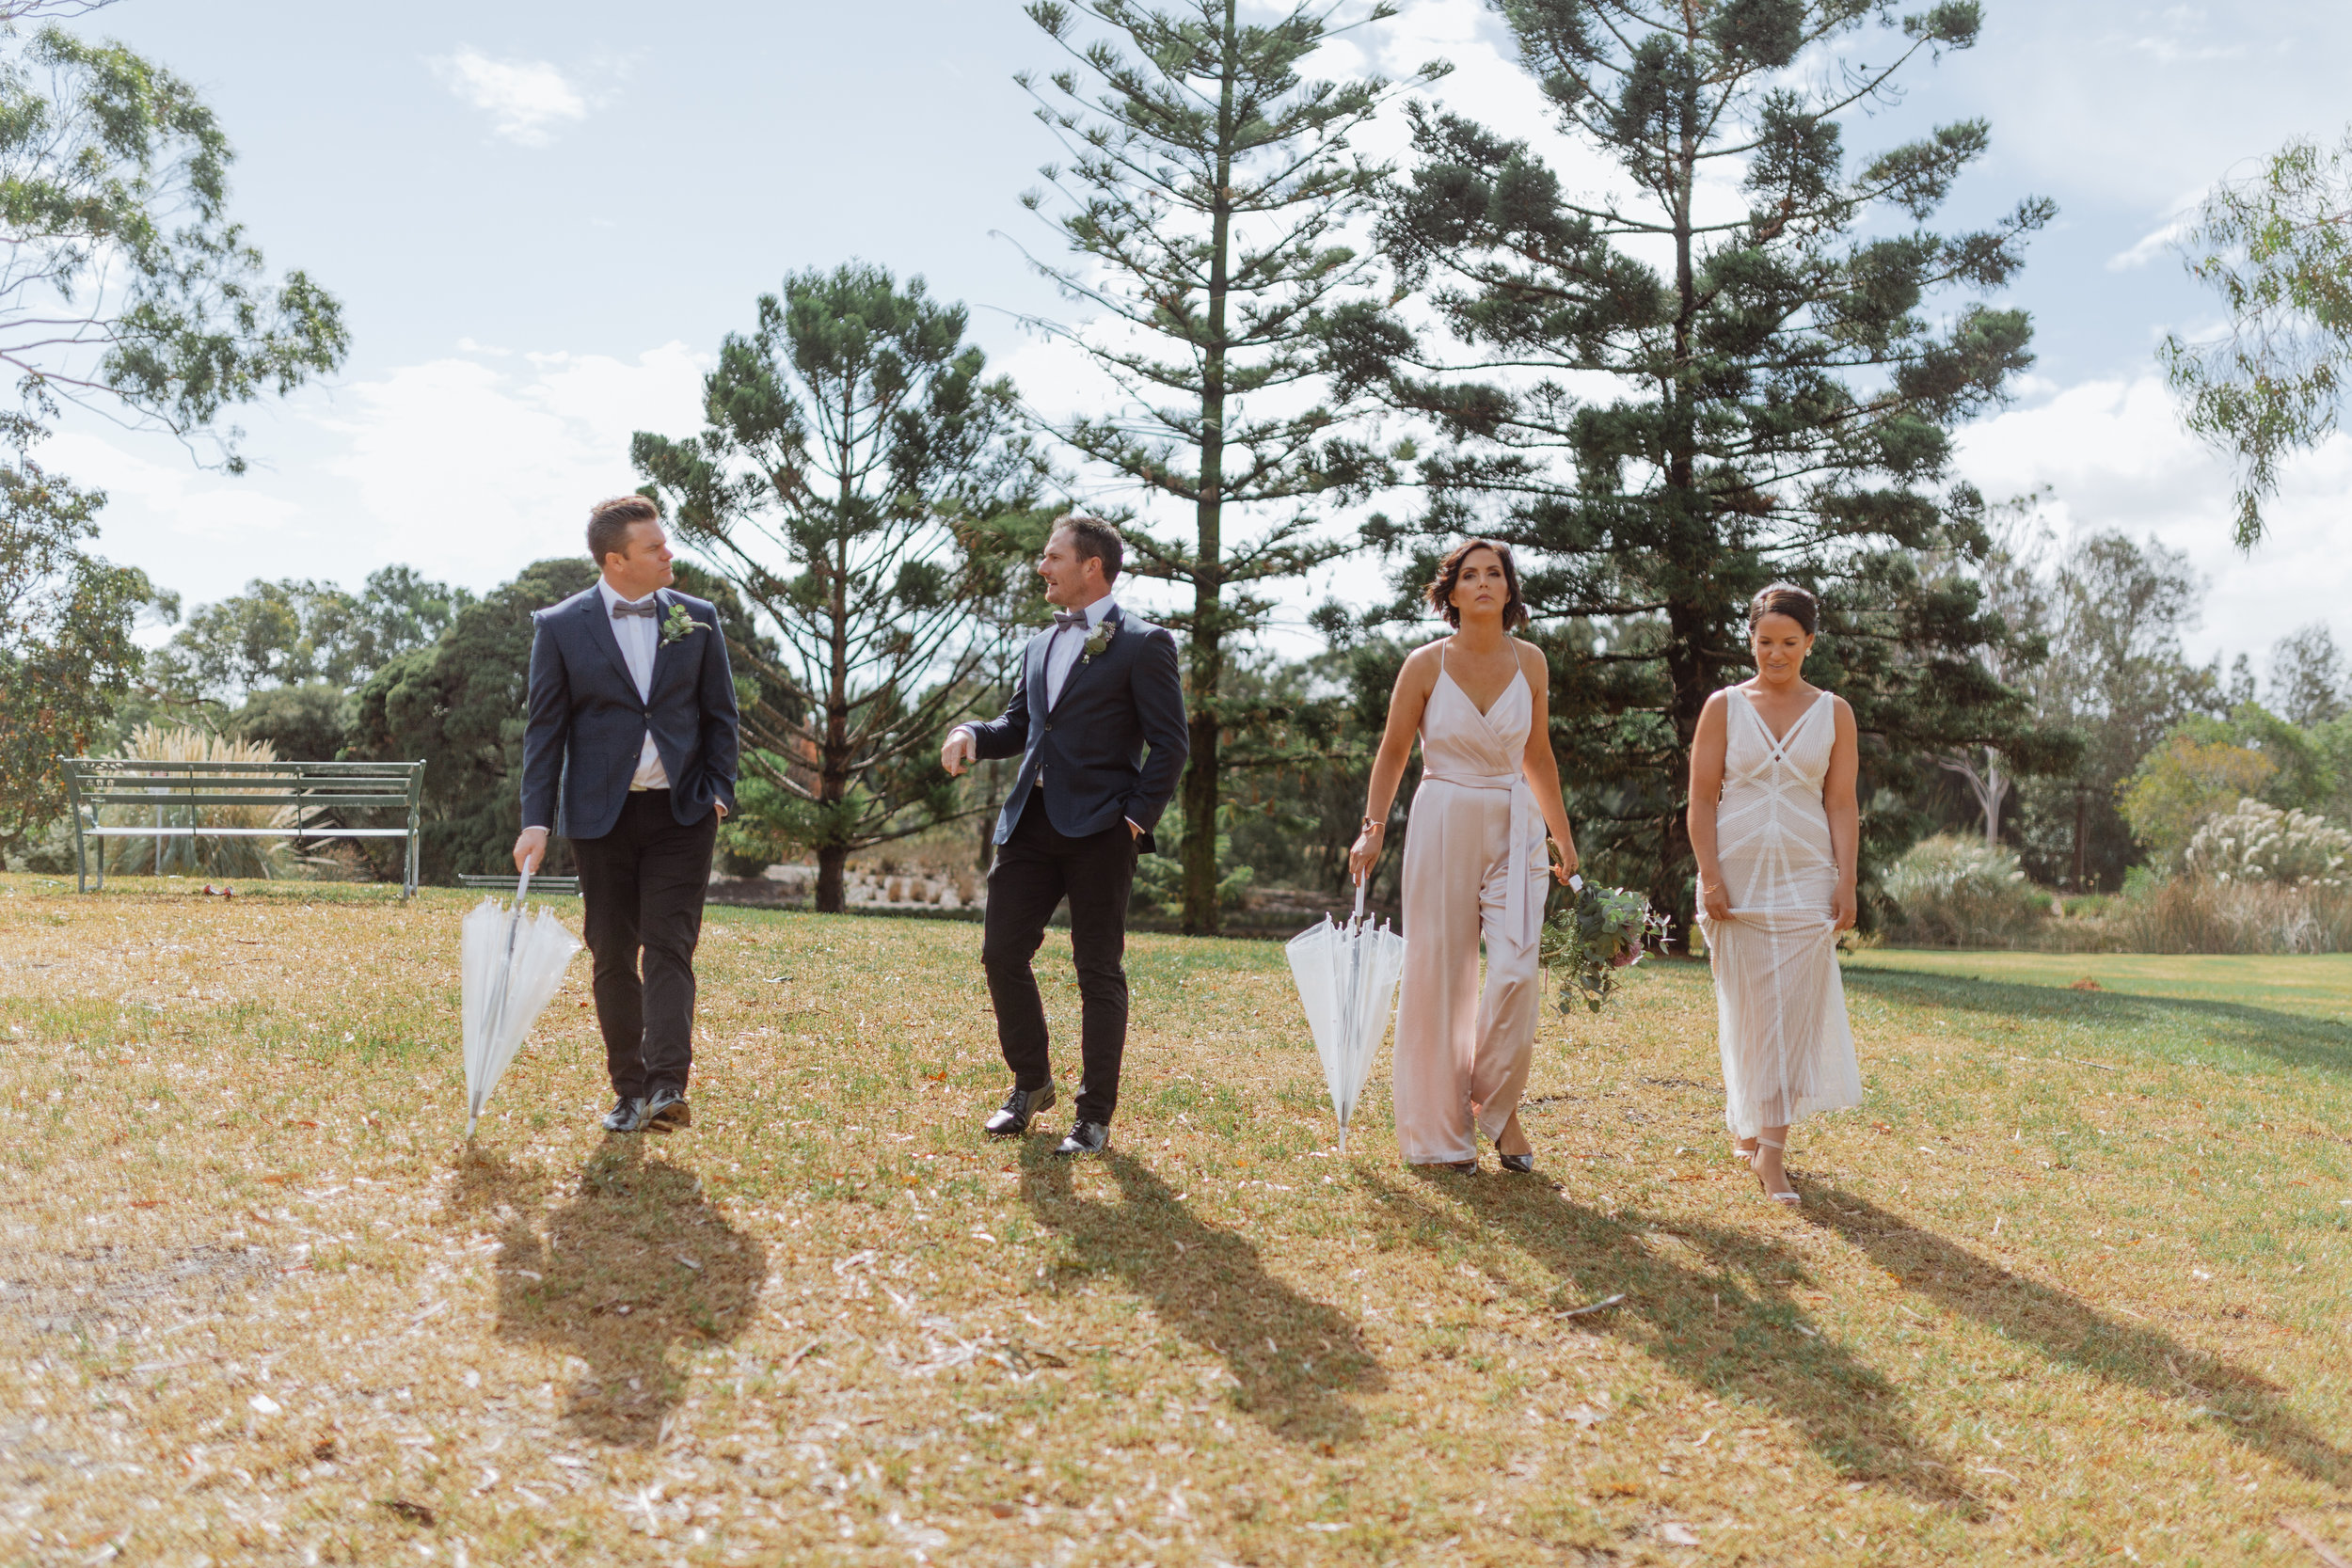 Wedding_Party_Portraits-98.jpg